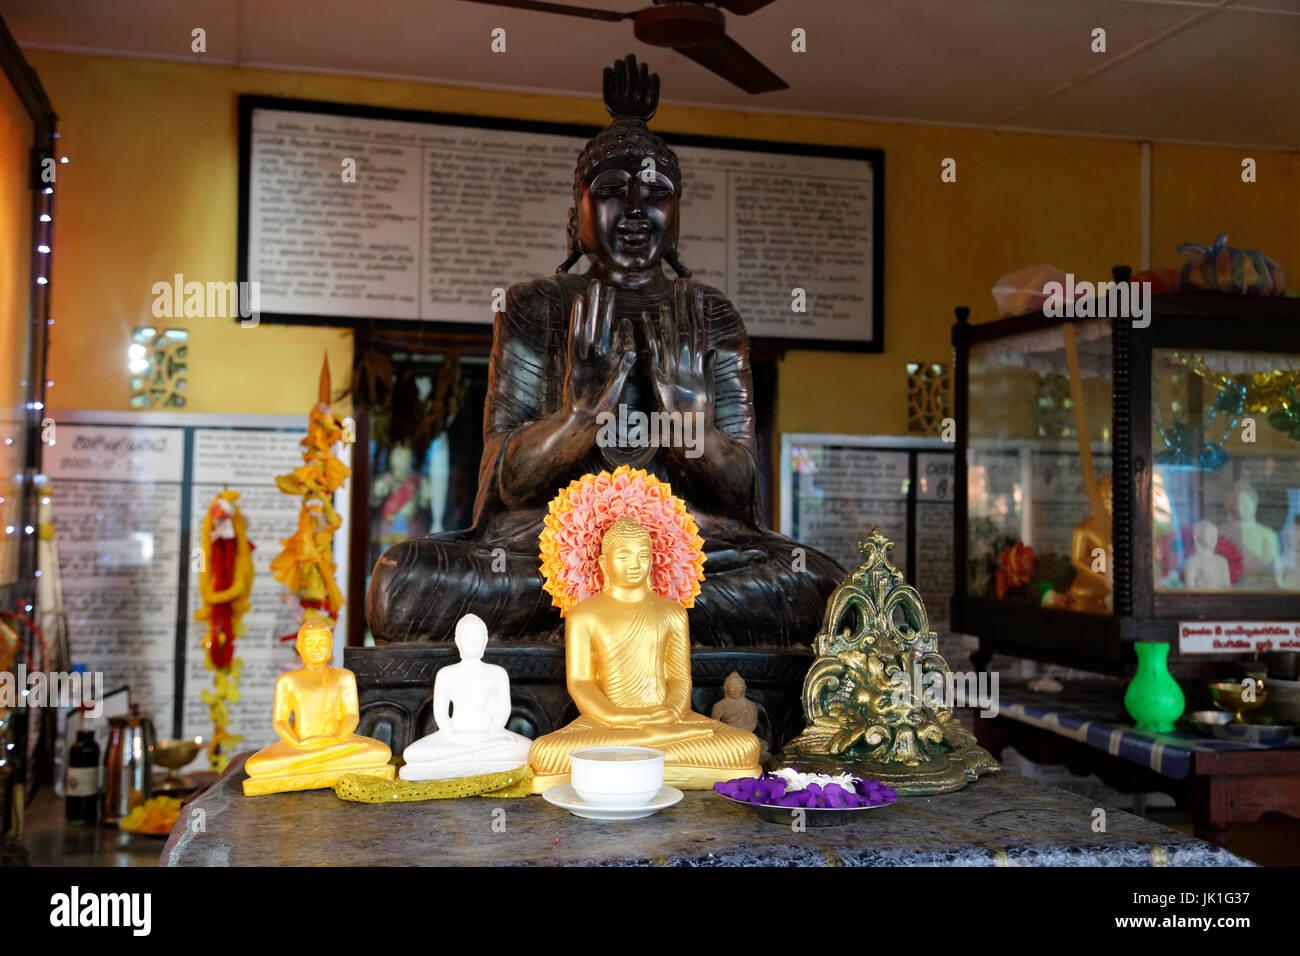 Galle Sri Lanka Rumassala Road Sri Vivekaramaya Temple Statue Of Buddha With Left Hand In Vitarka Mudra Gesture - Stock Image